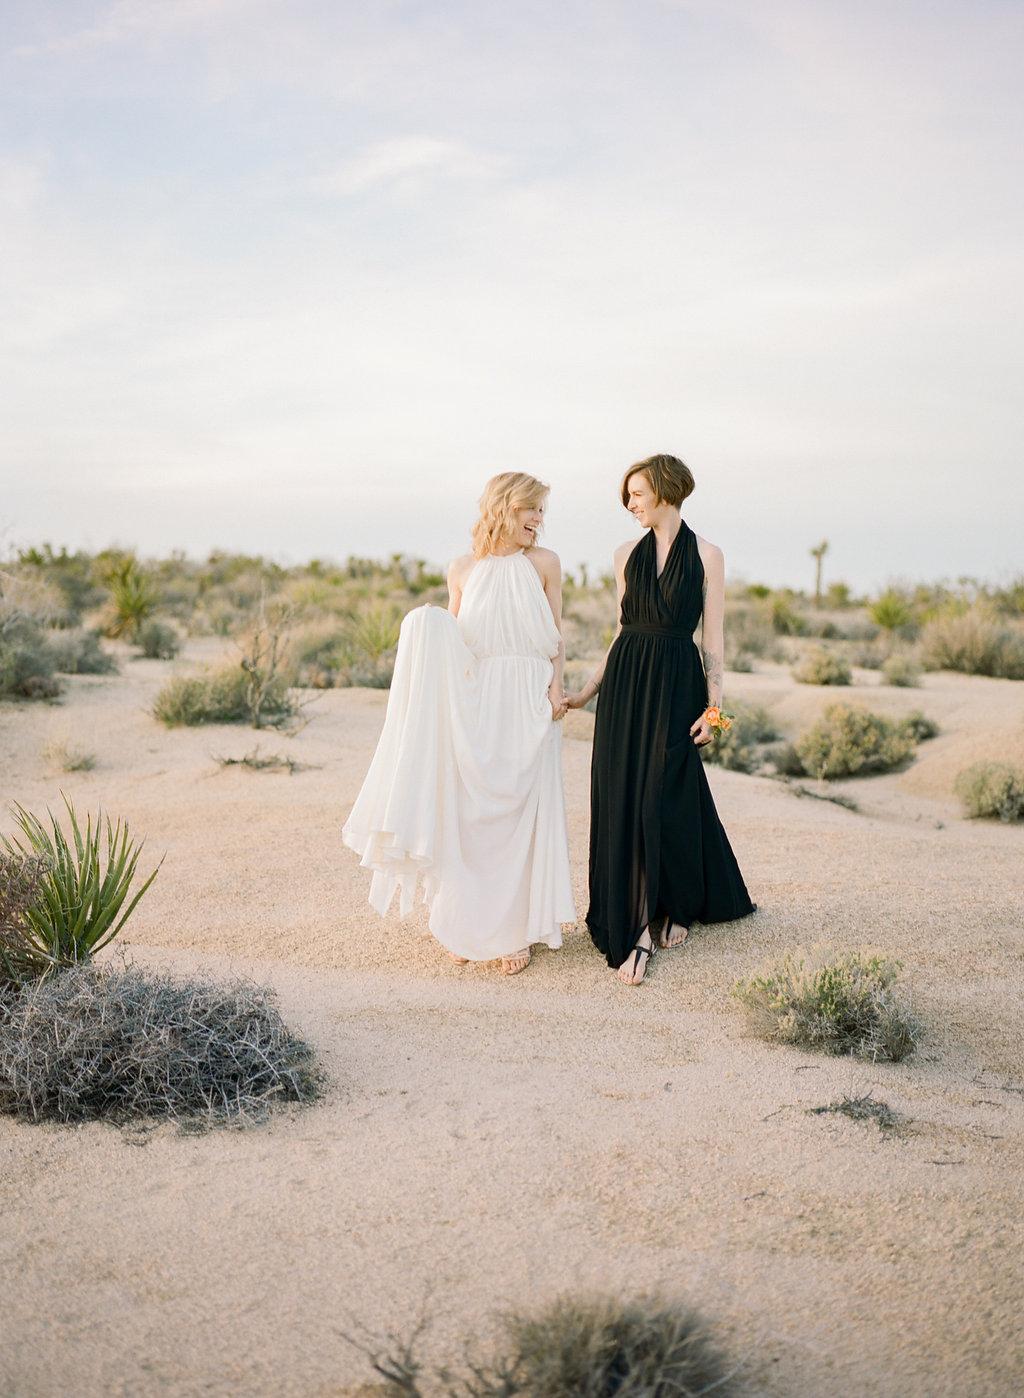 Jessica Schilling Wedding Photography couple walking